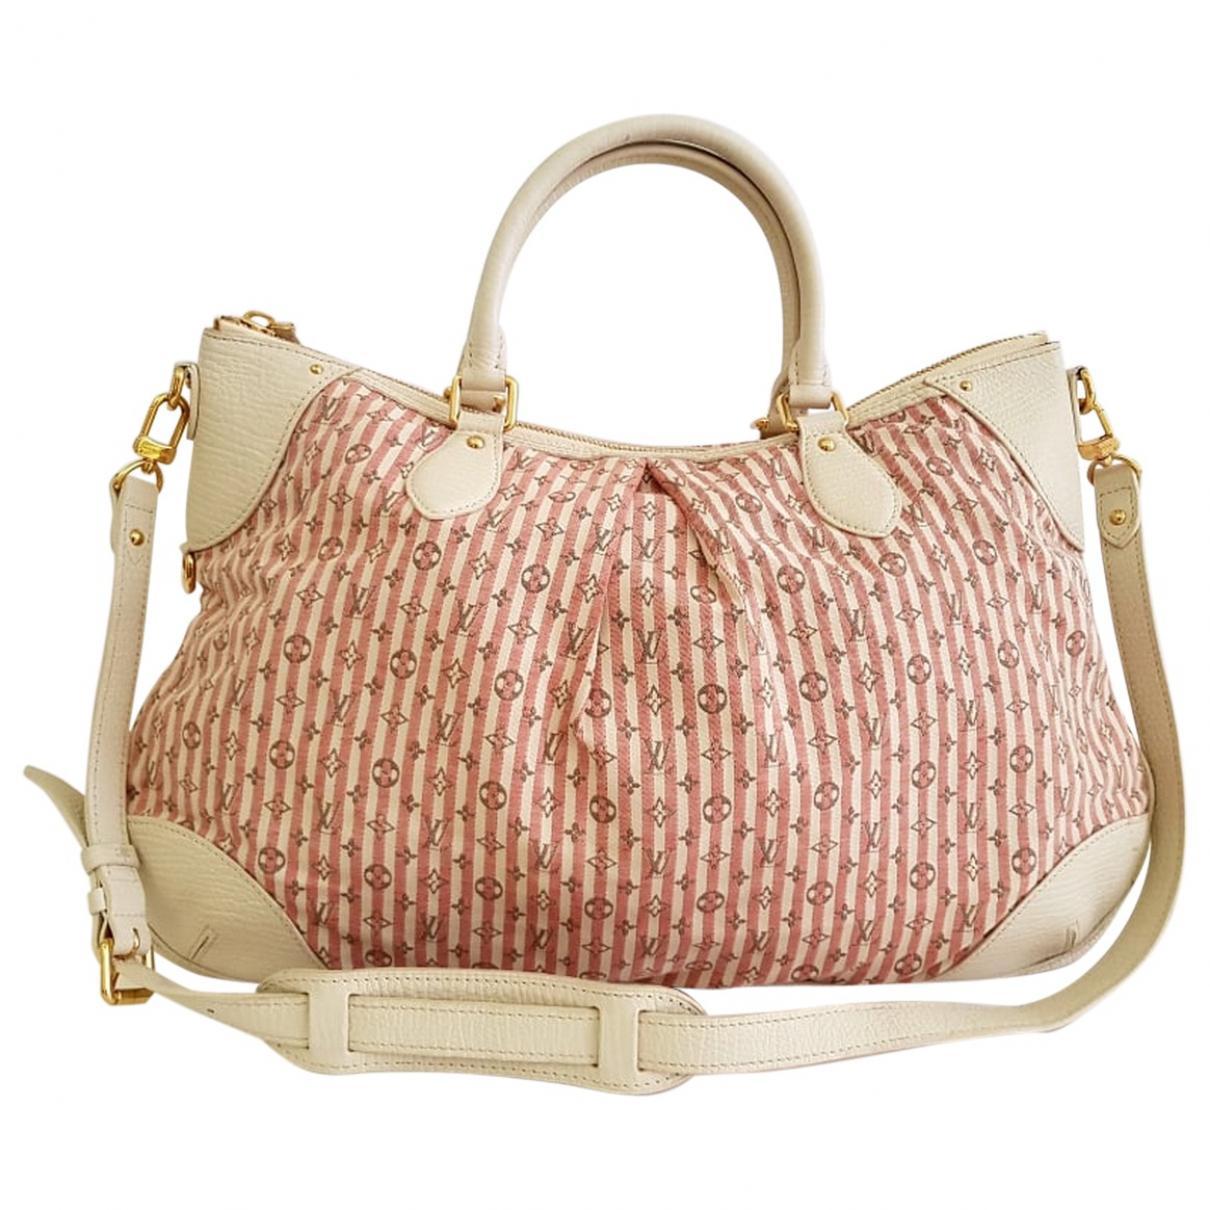 9fe16787d07c Lyst - Louis Vuitton Pre-owned Croisette Cloth Handbag in Pink